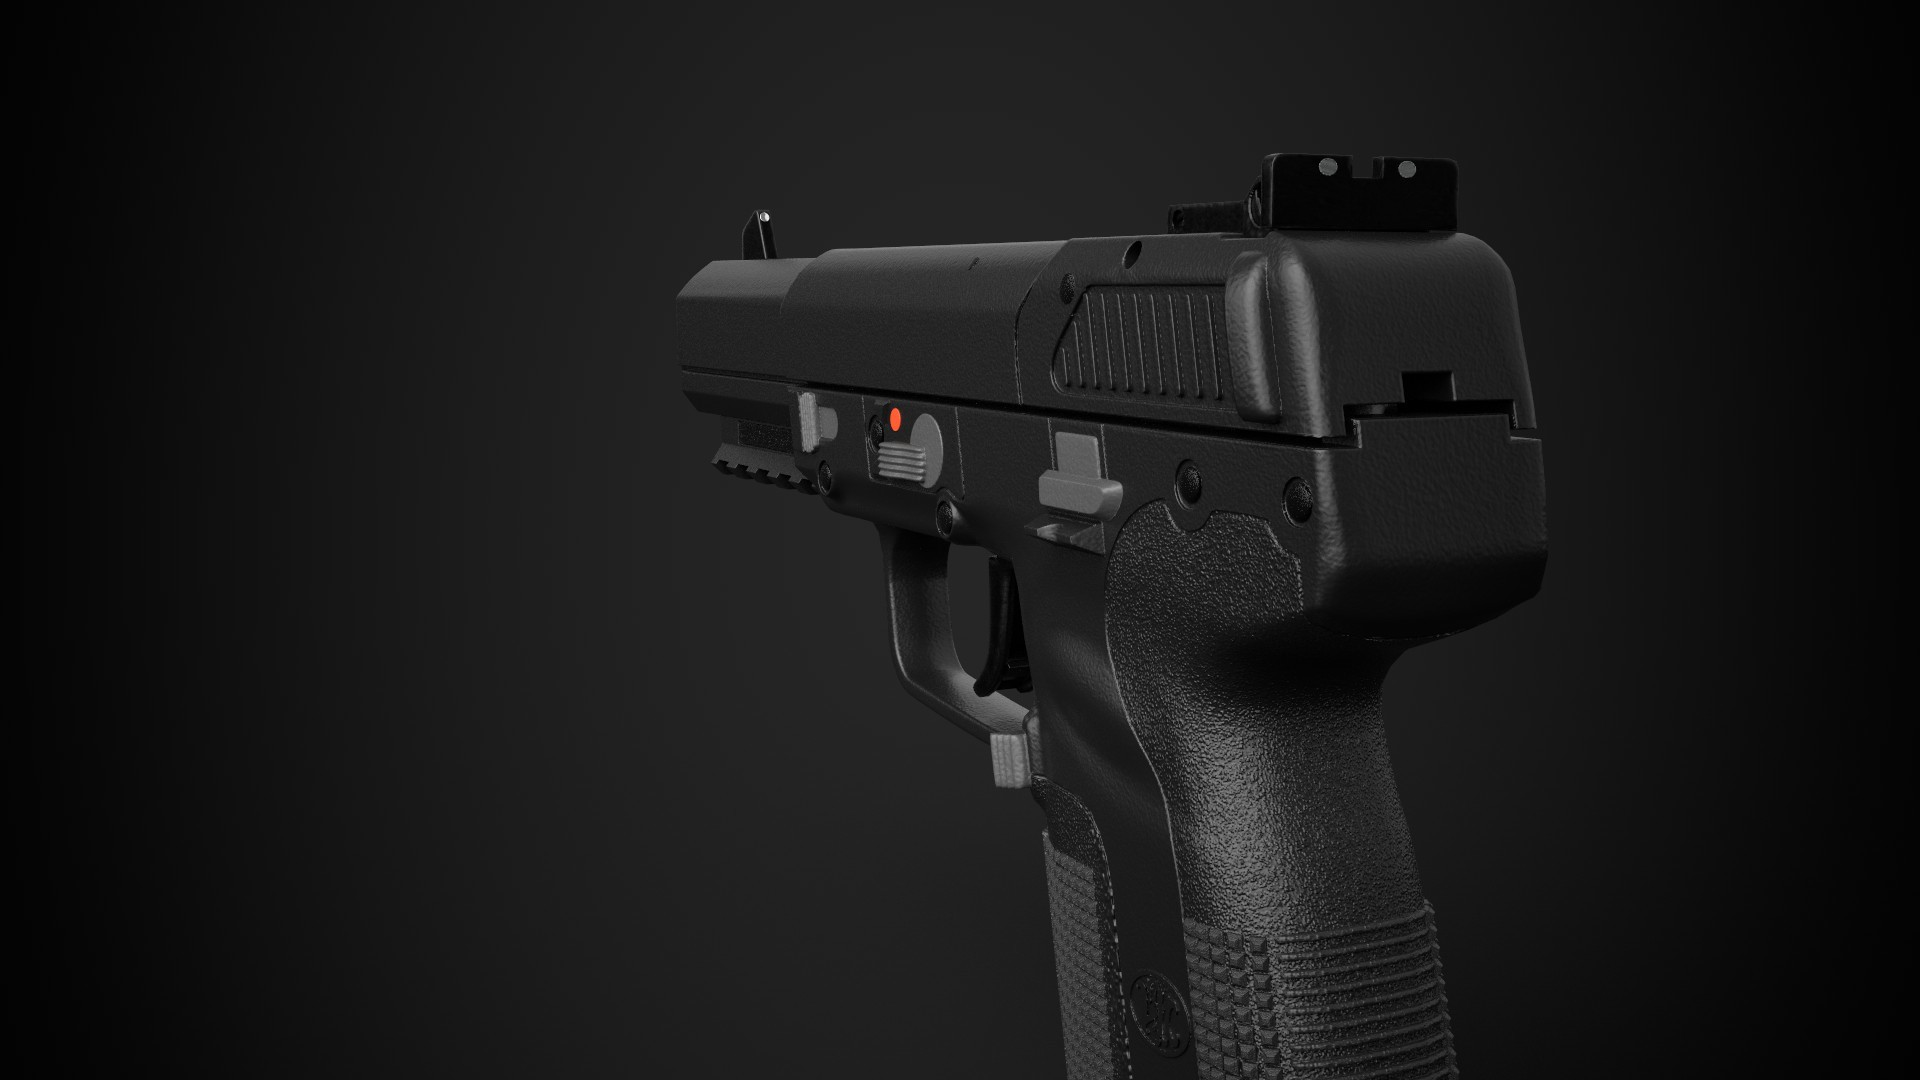 Oleksandr Pelypenko - FN Five-seveN pistol